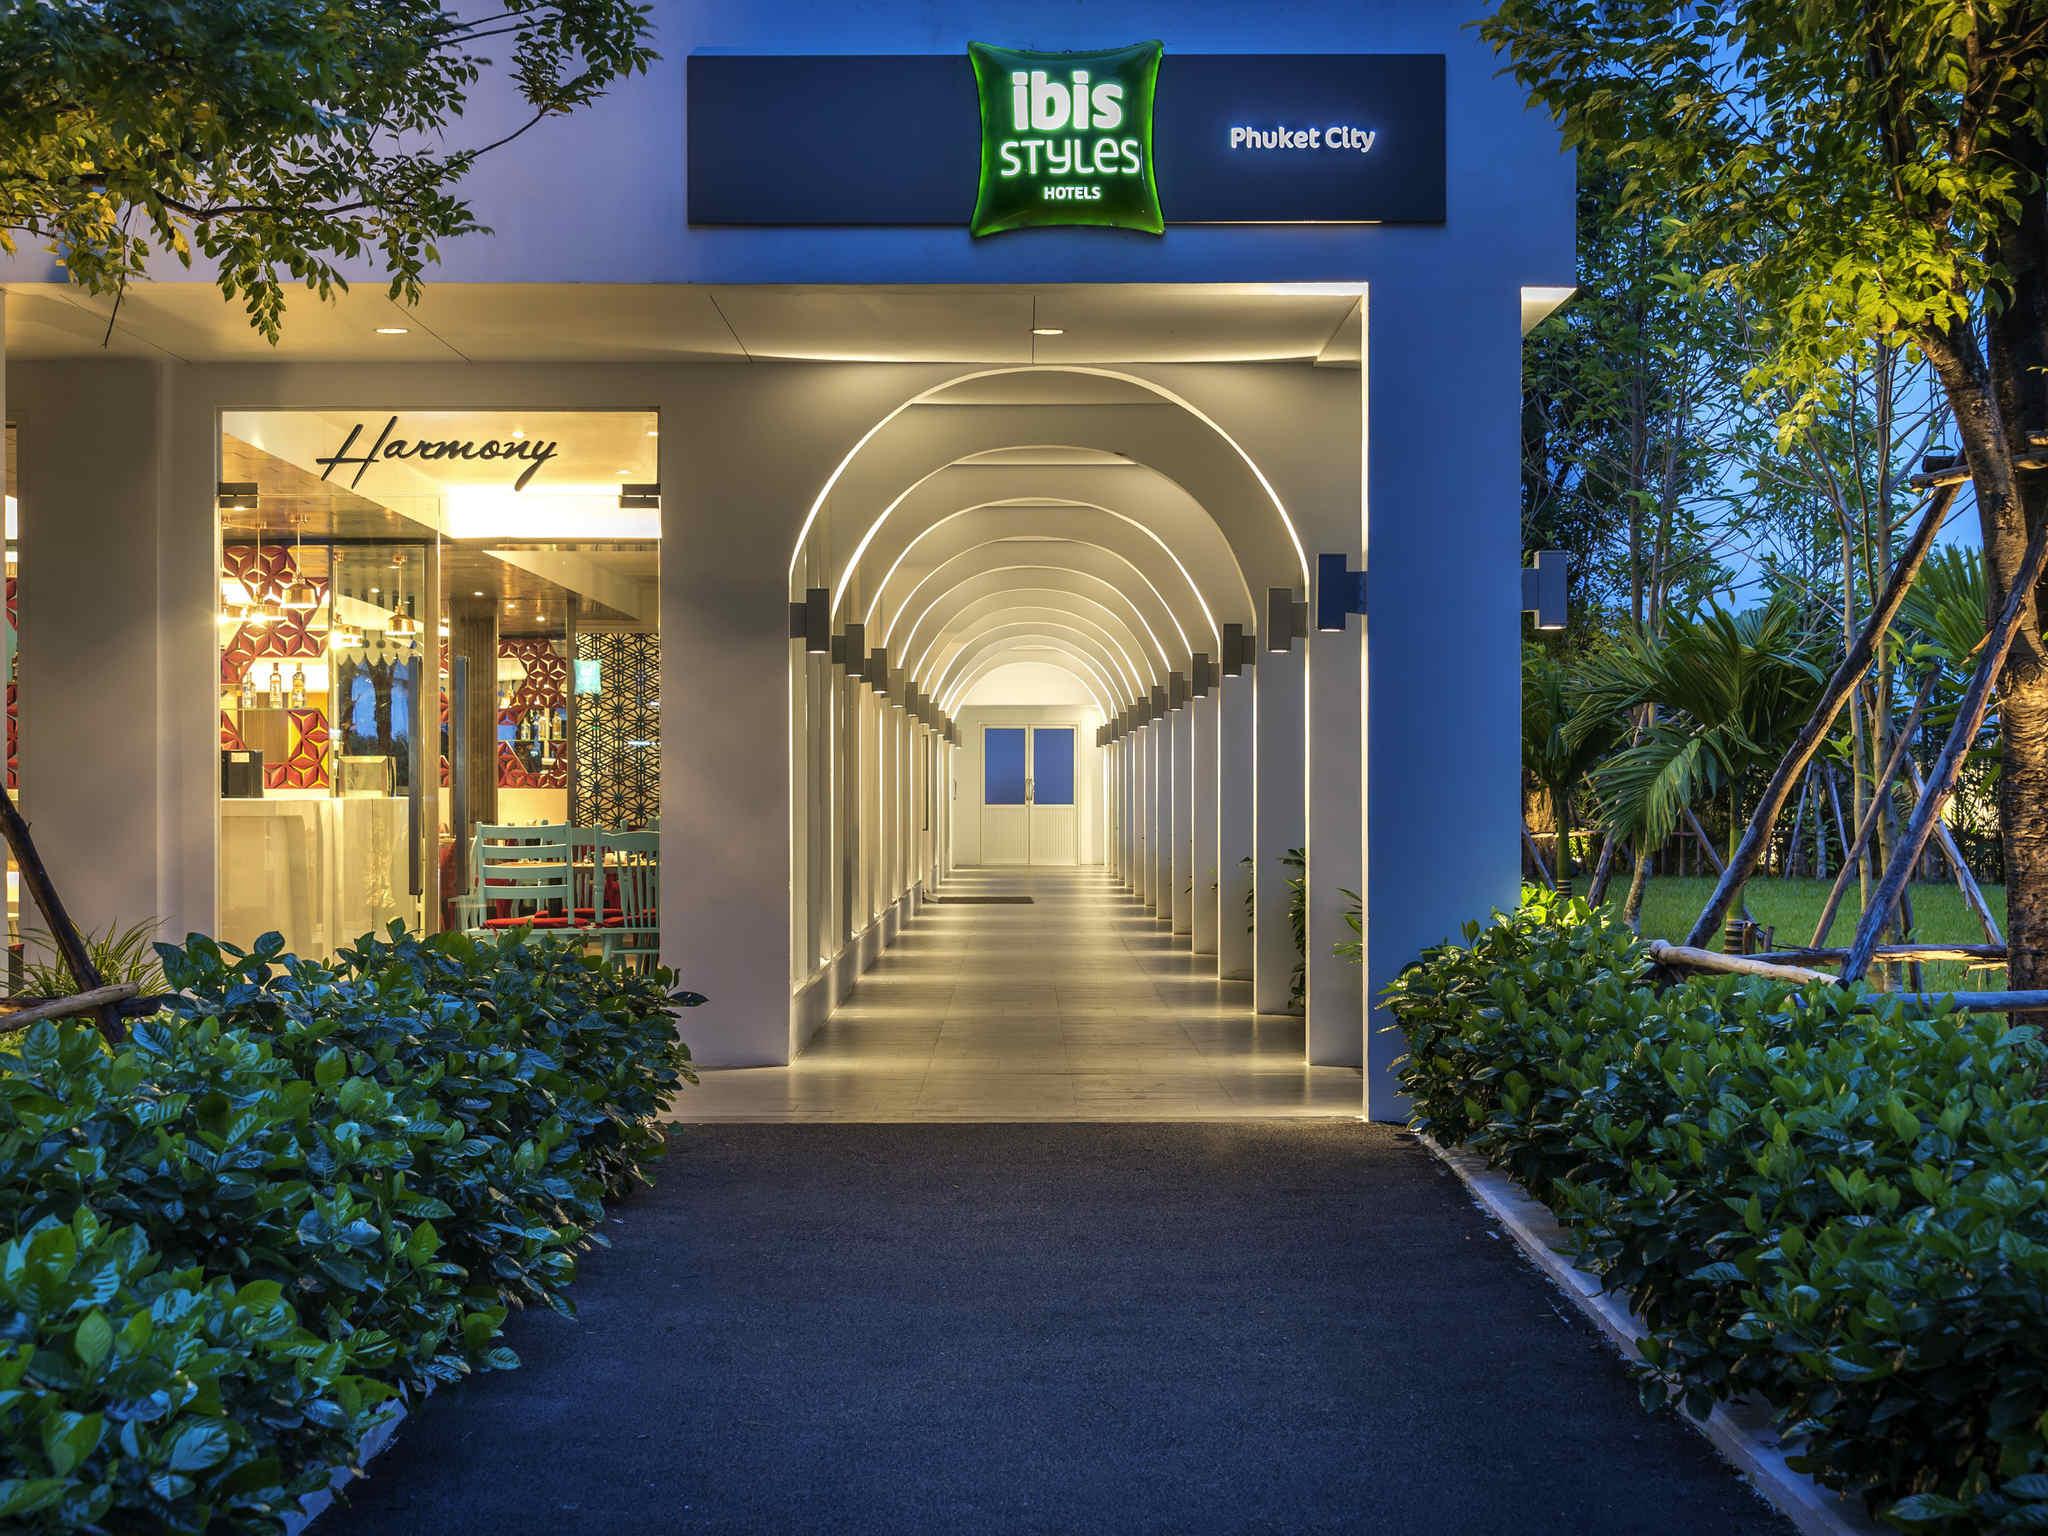 Otel – ibis Styles Phuket City